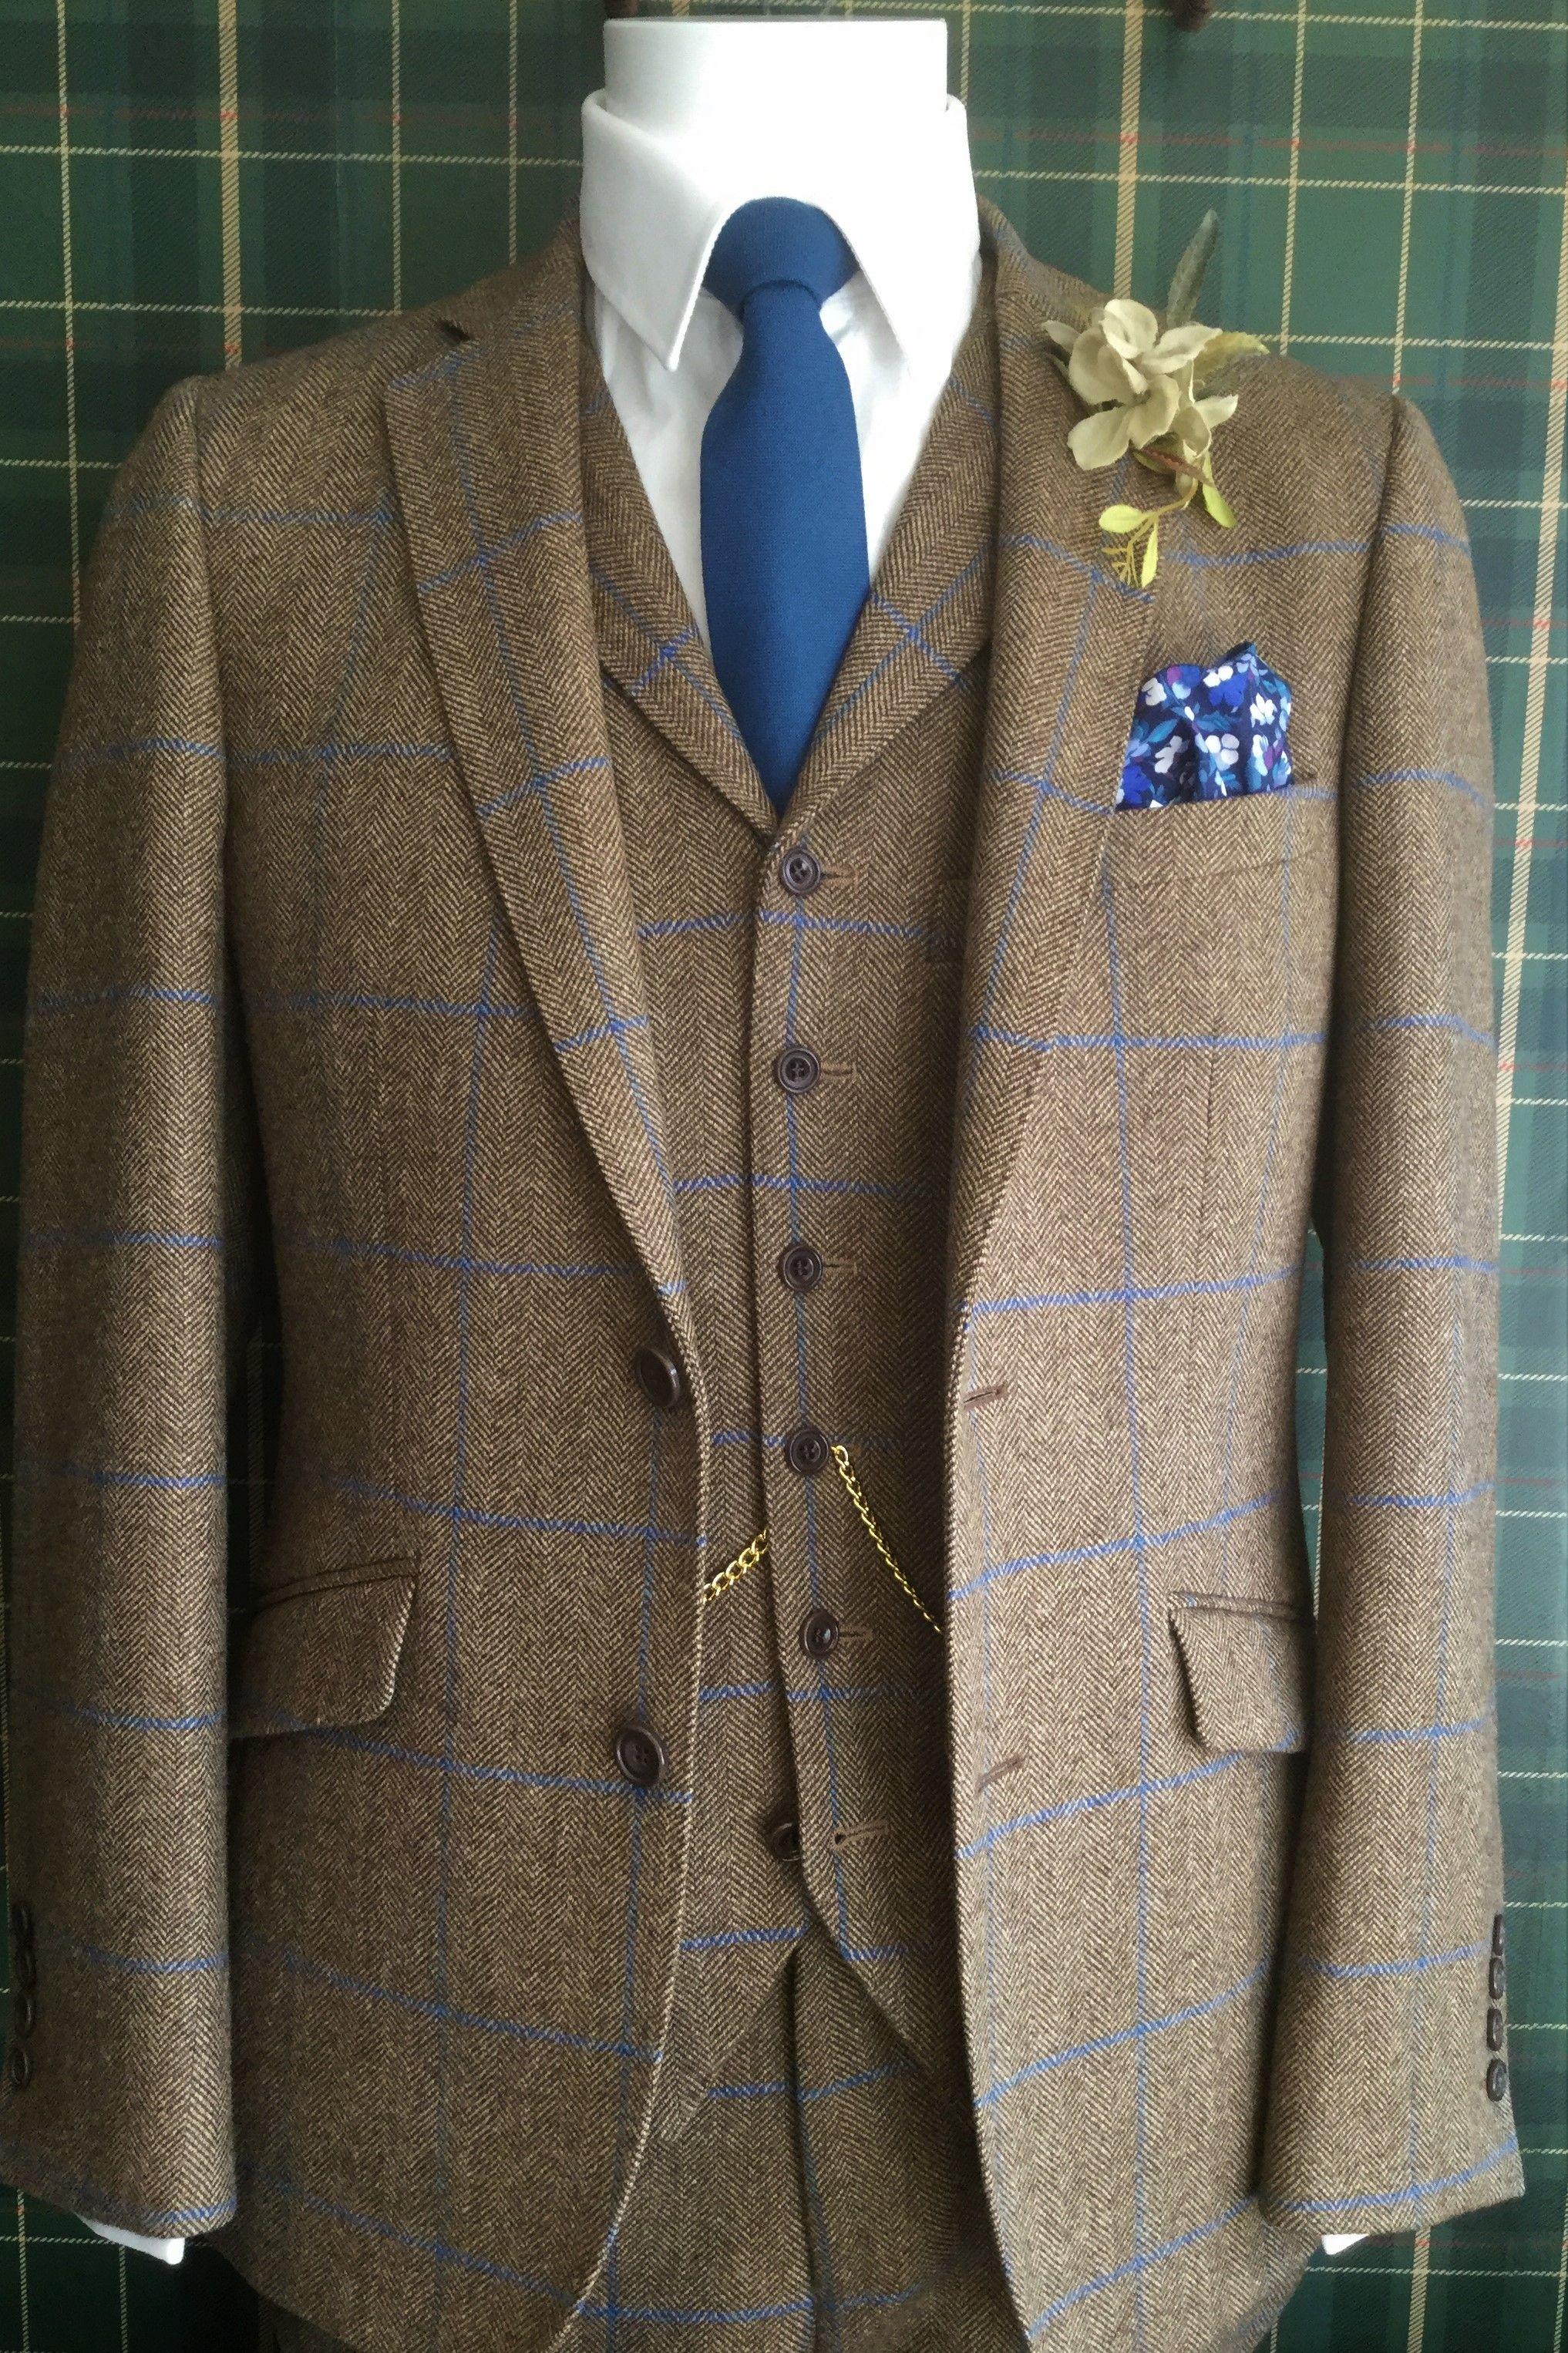 43ac9dbf3b6b Tweed Suit Hire Berkshire, Hampshire & Surrey | Suits | Tweed suits ...